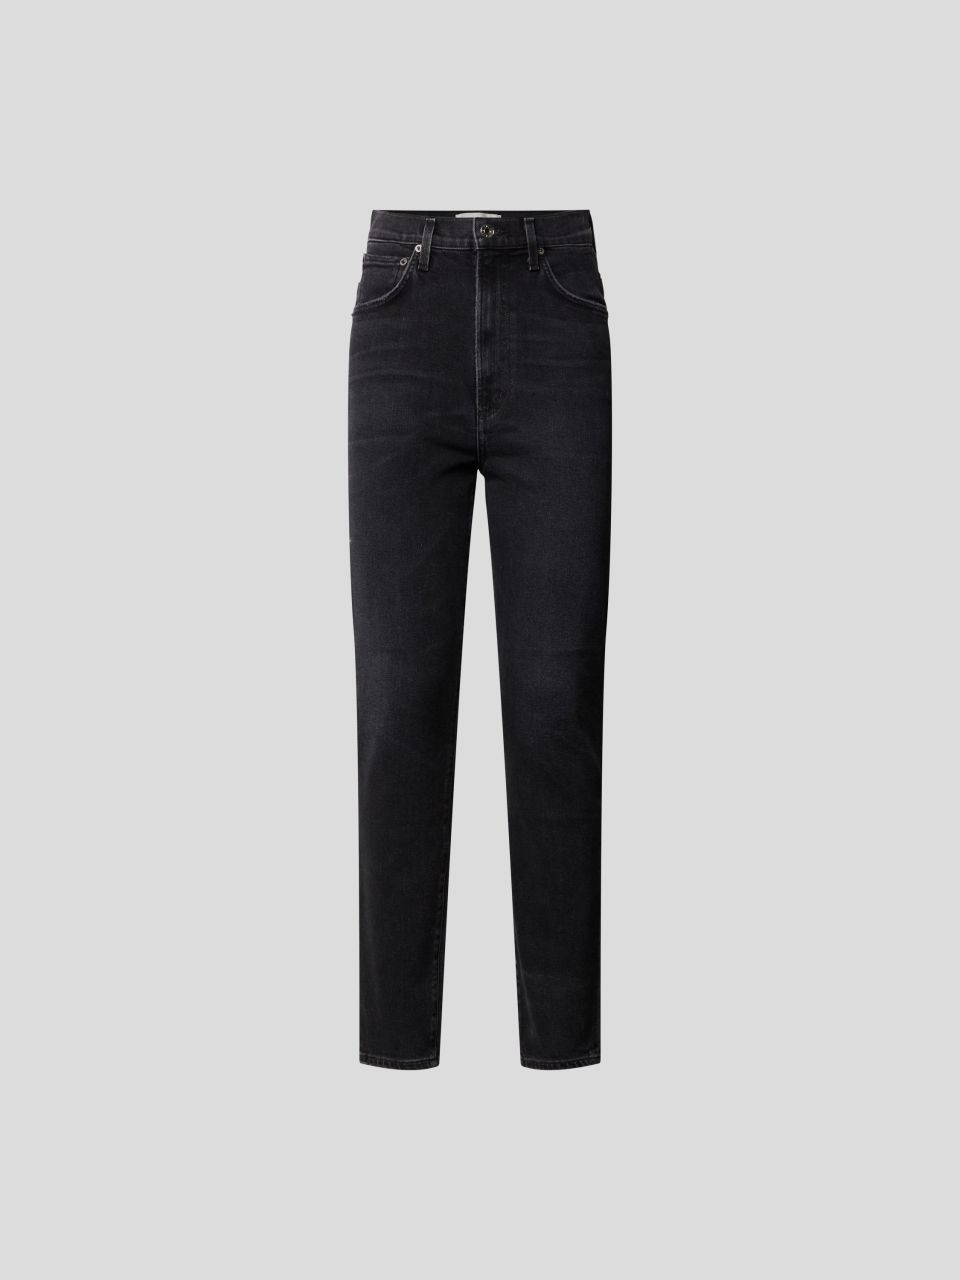 High Waist Jeans im Skinny Fit